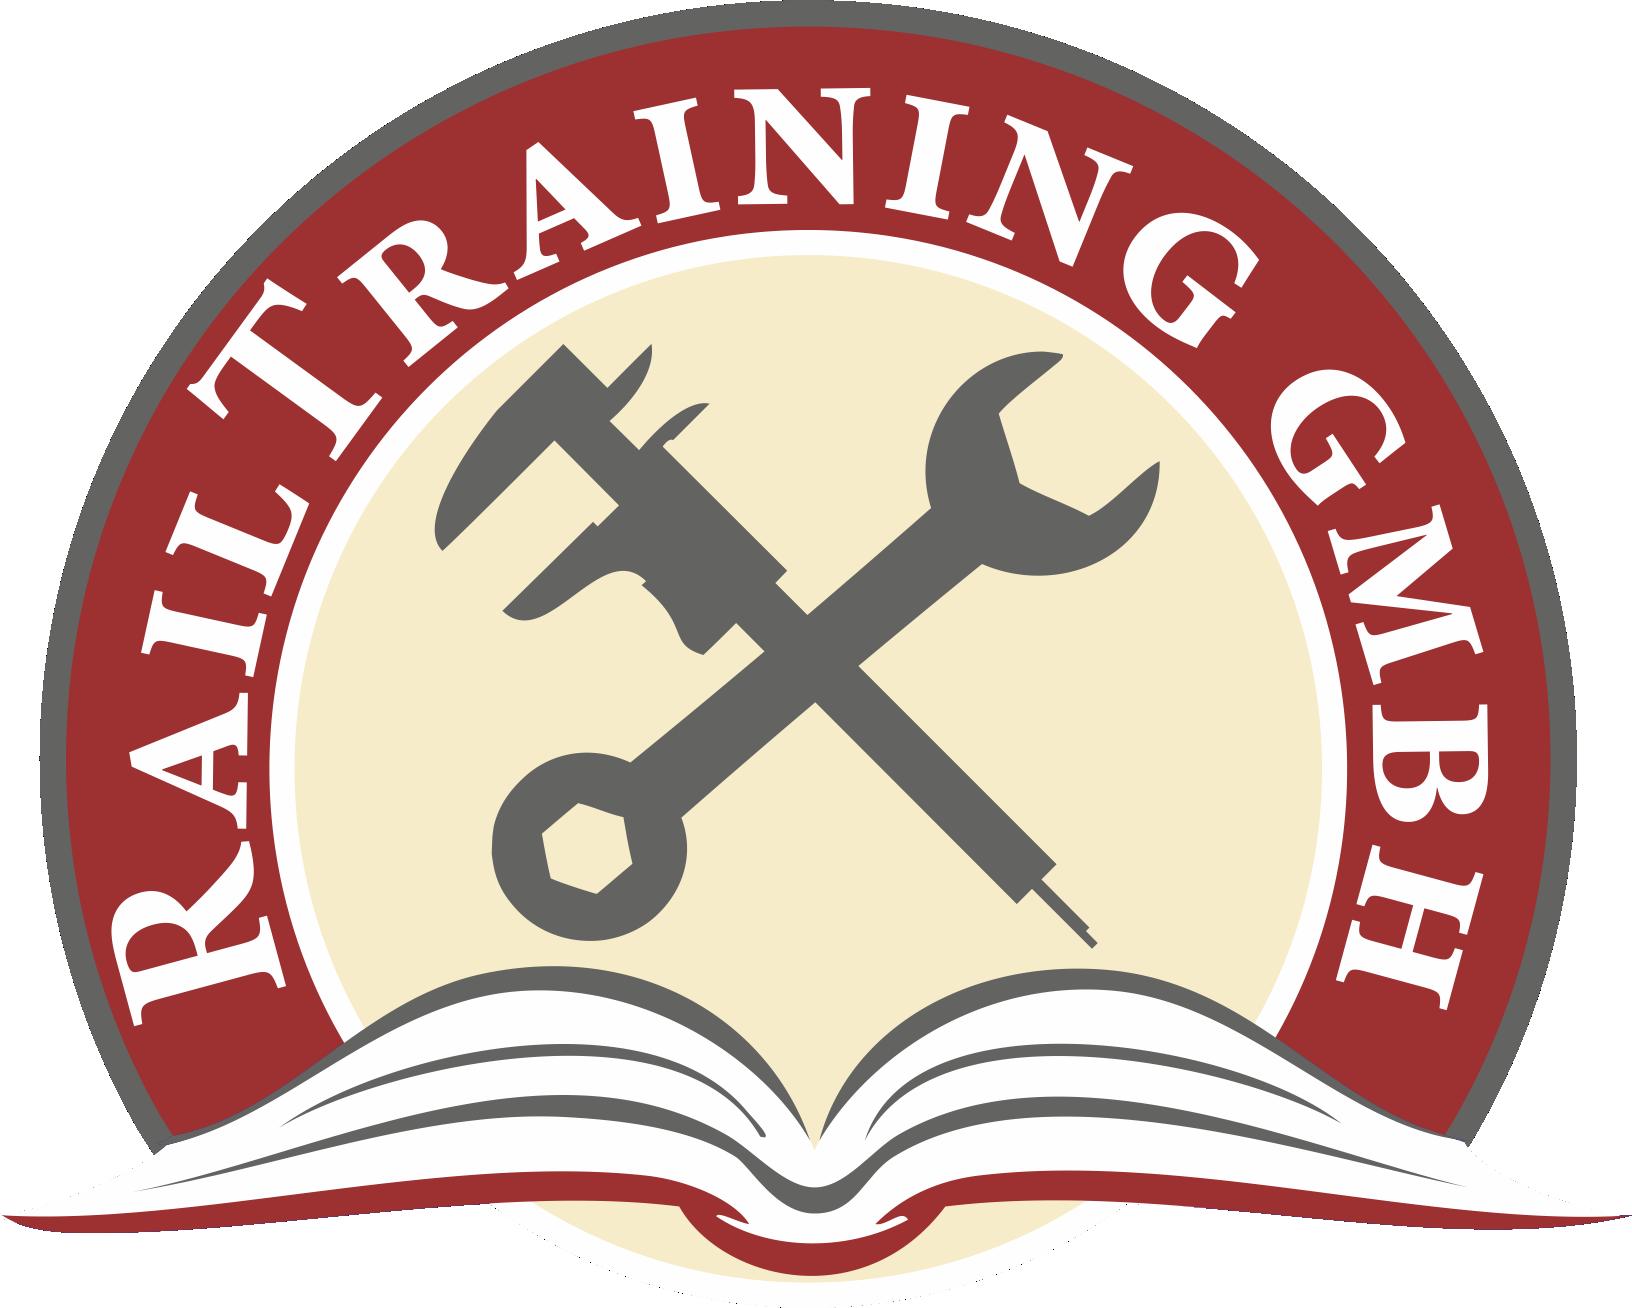 Railtraining Logo